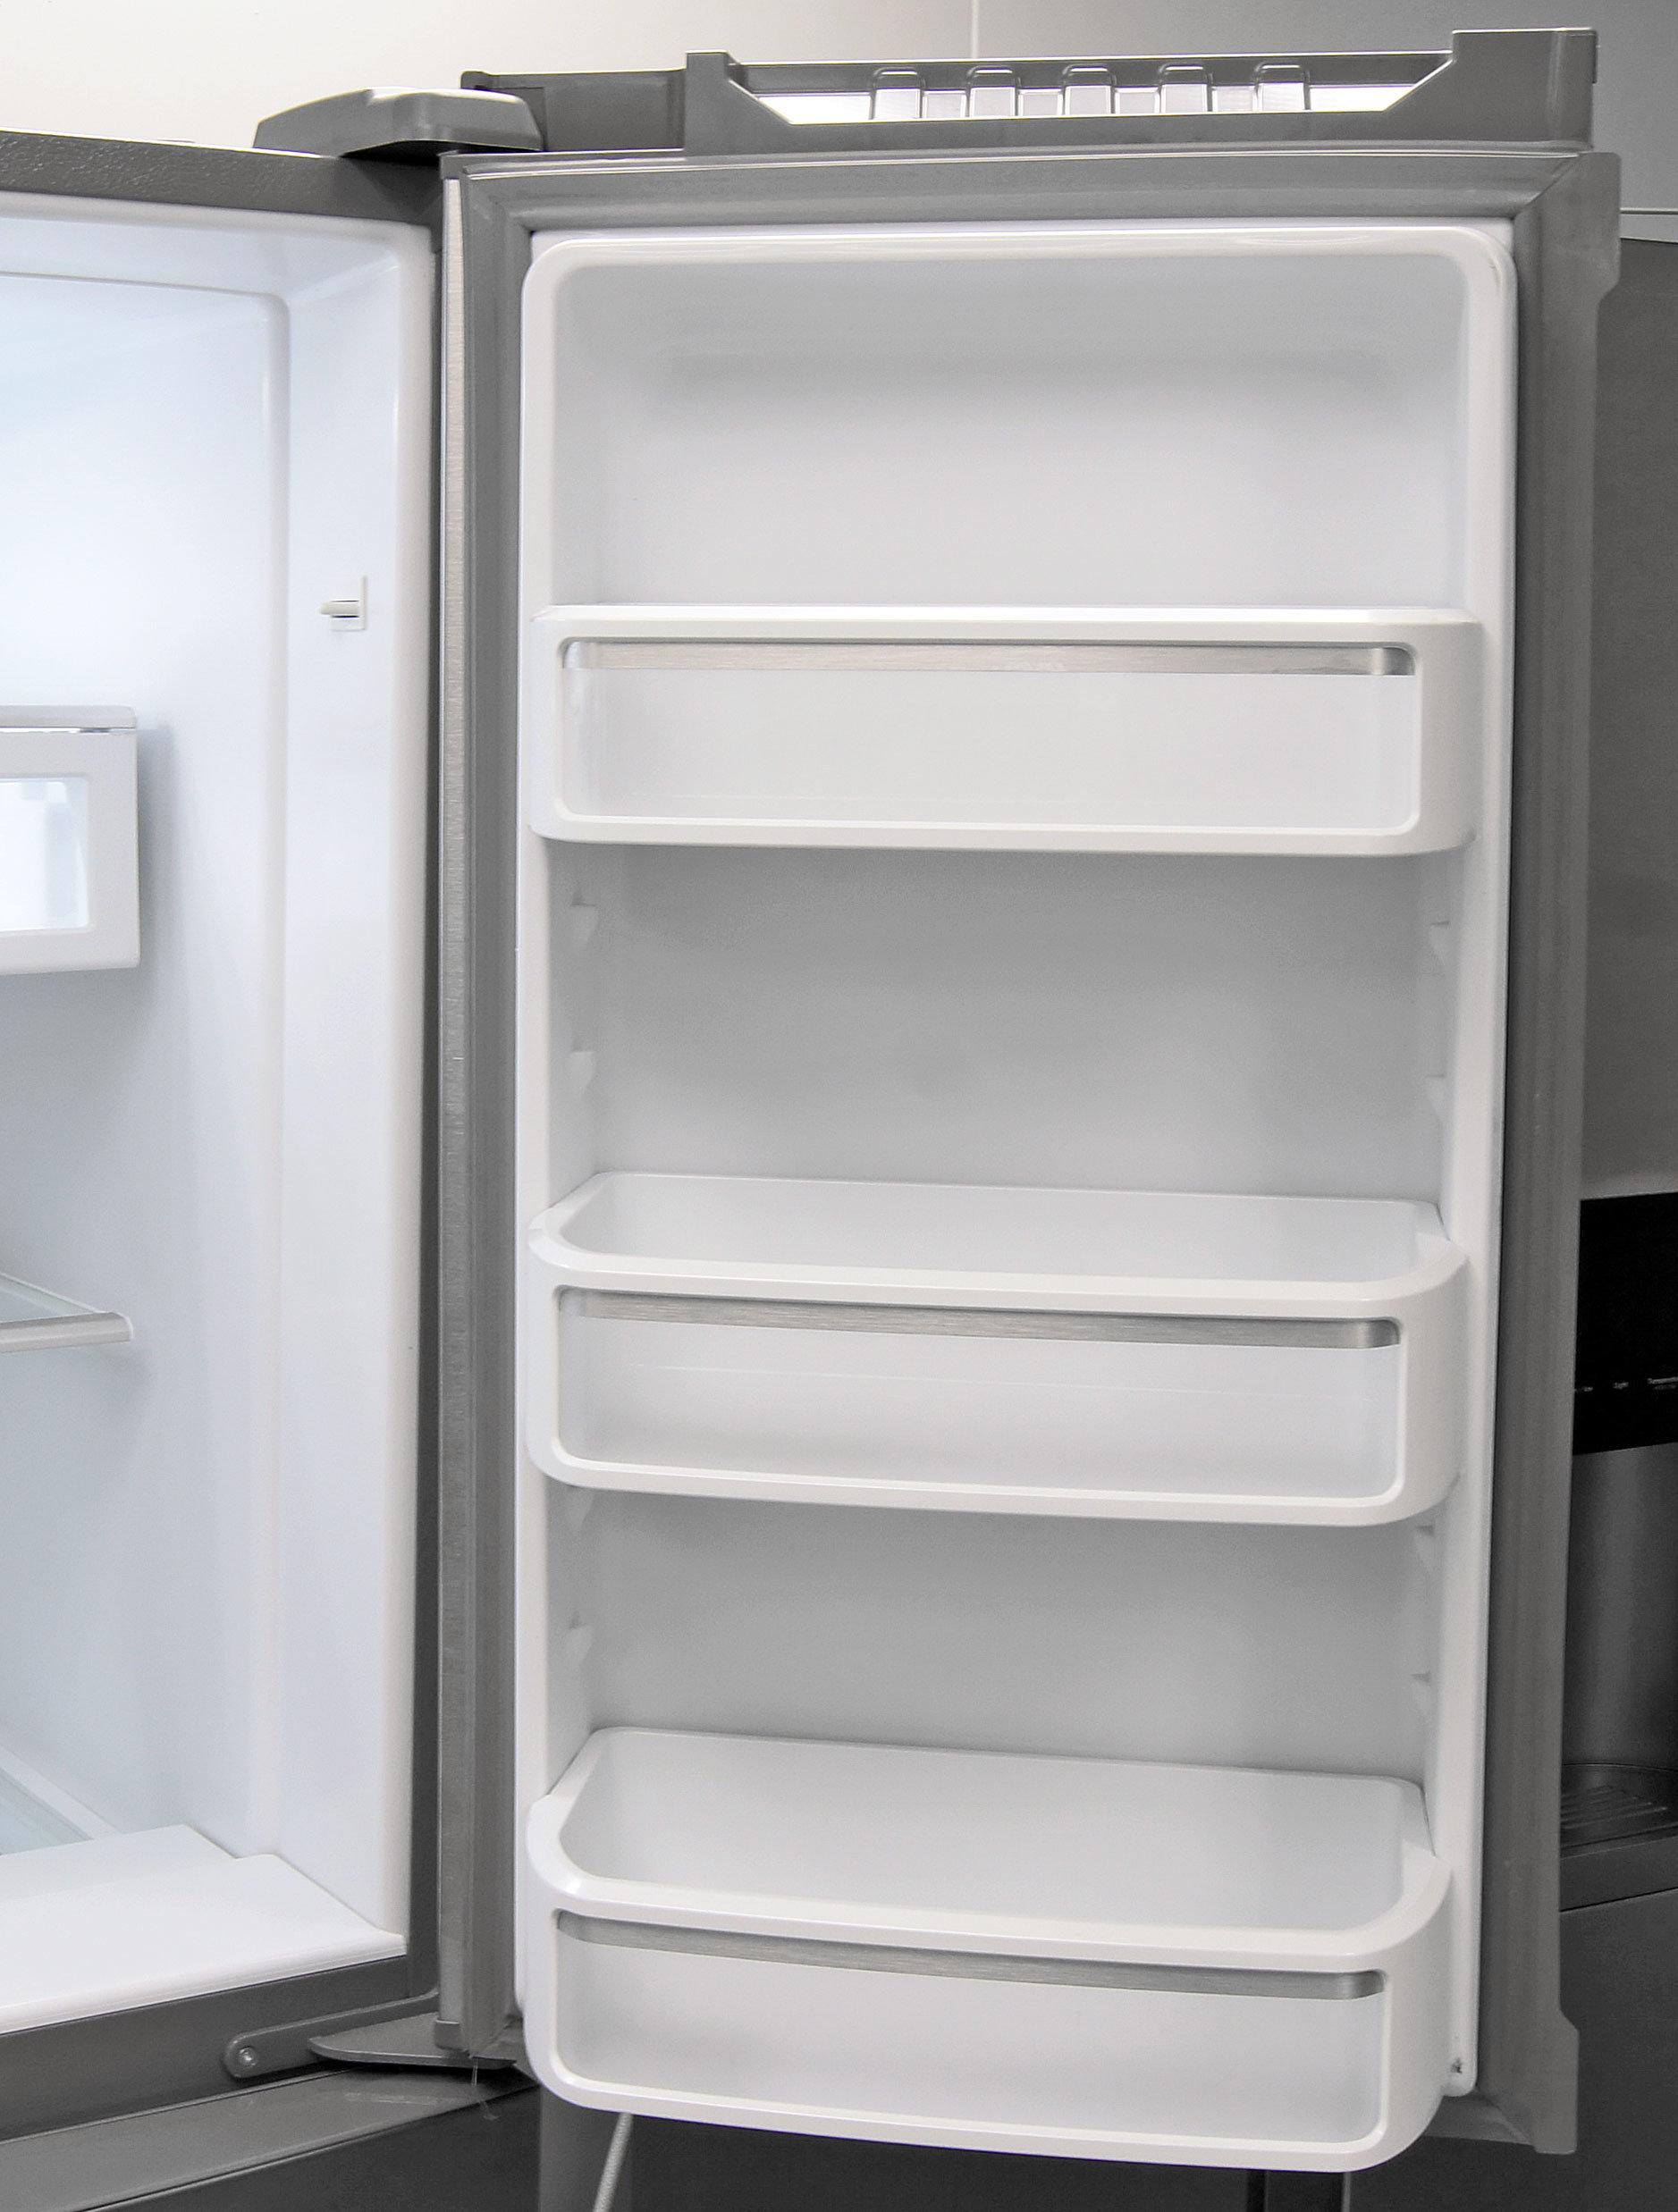 ... Kitchenaid Refrigerator Kfxs25ryms